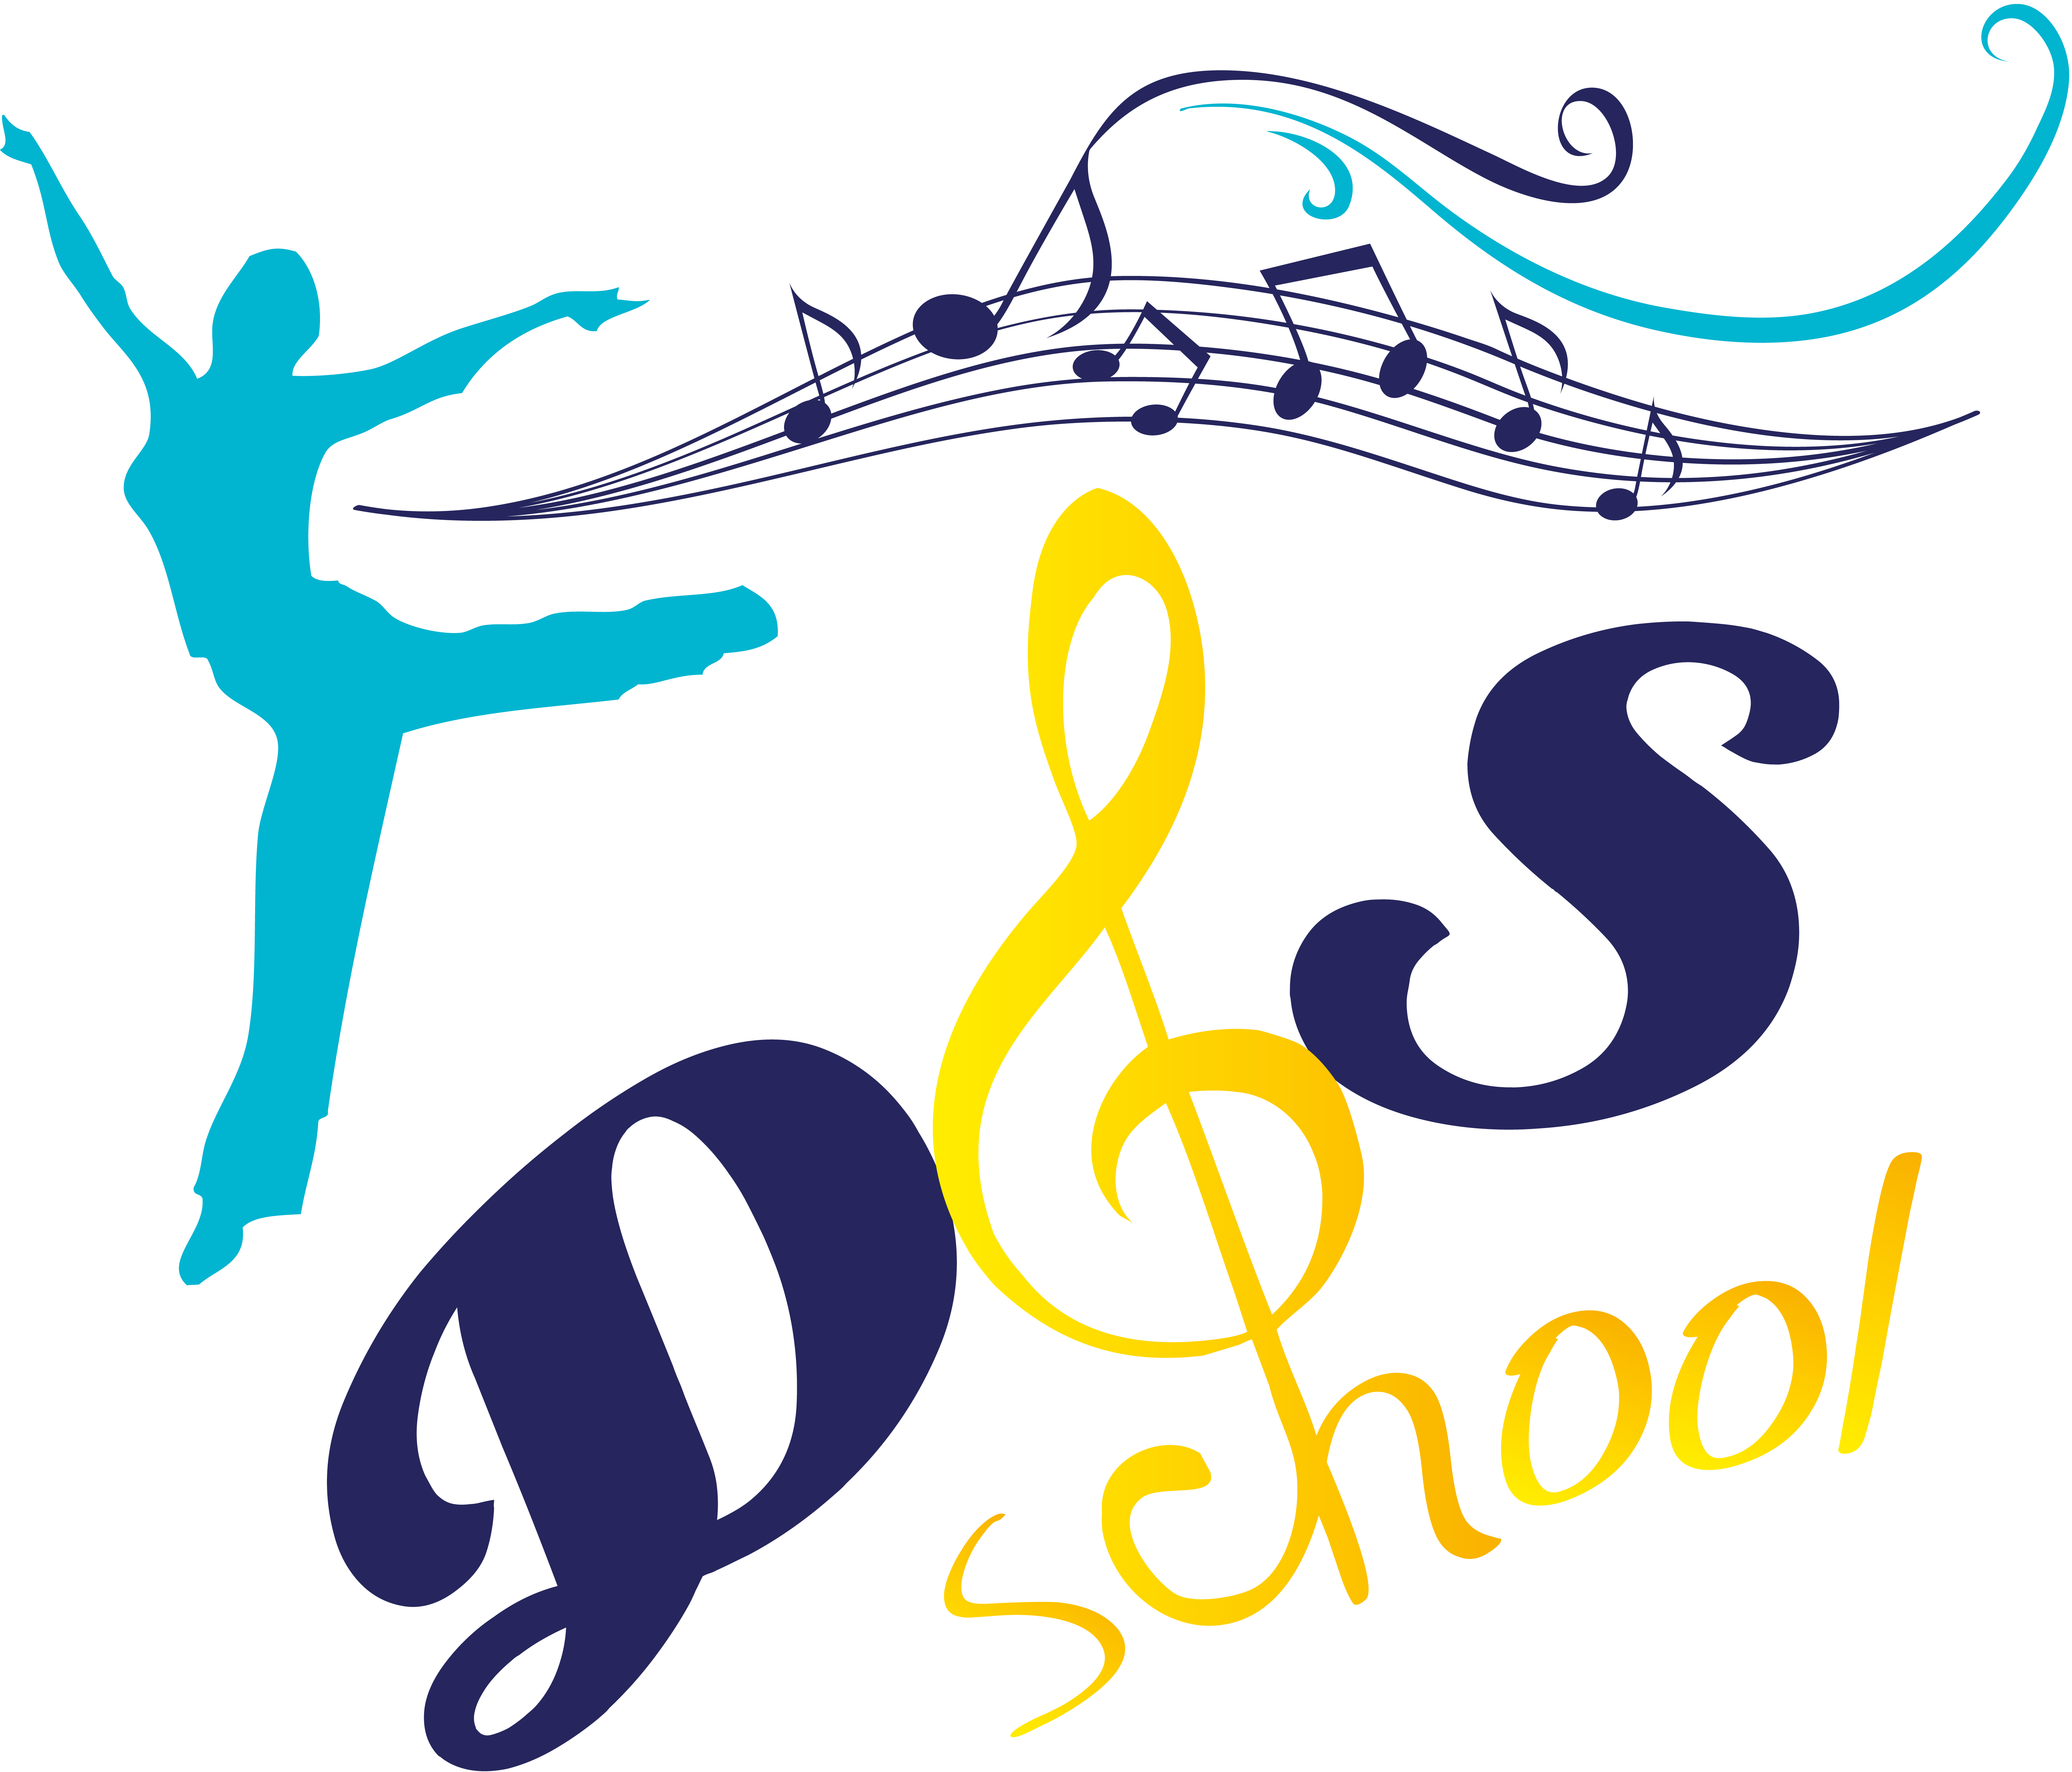 logo-dsschool-ok